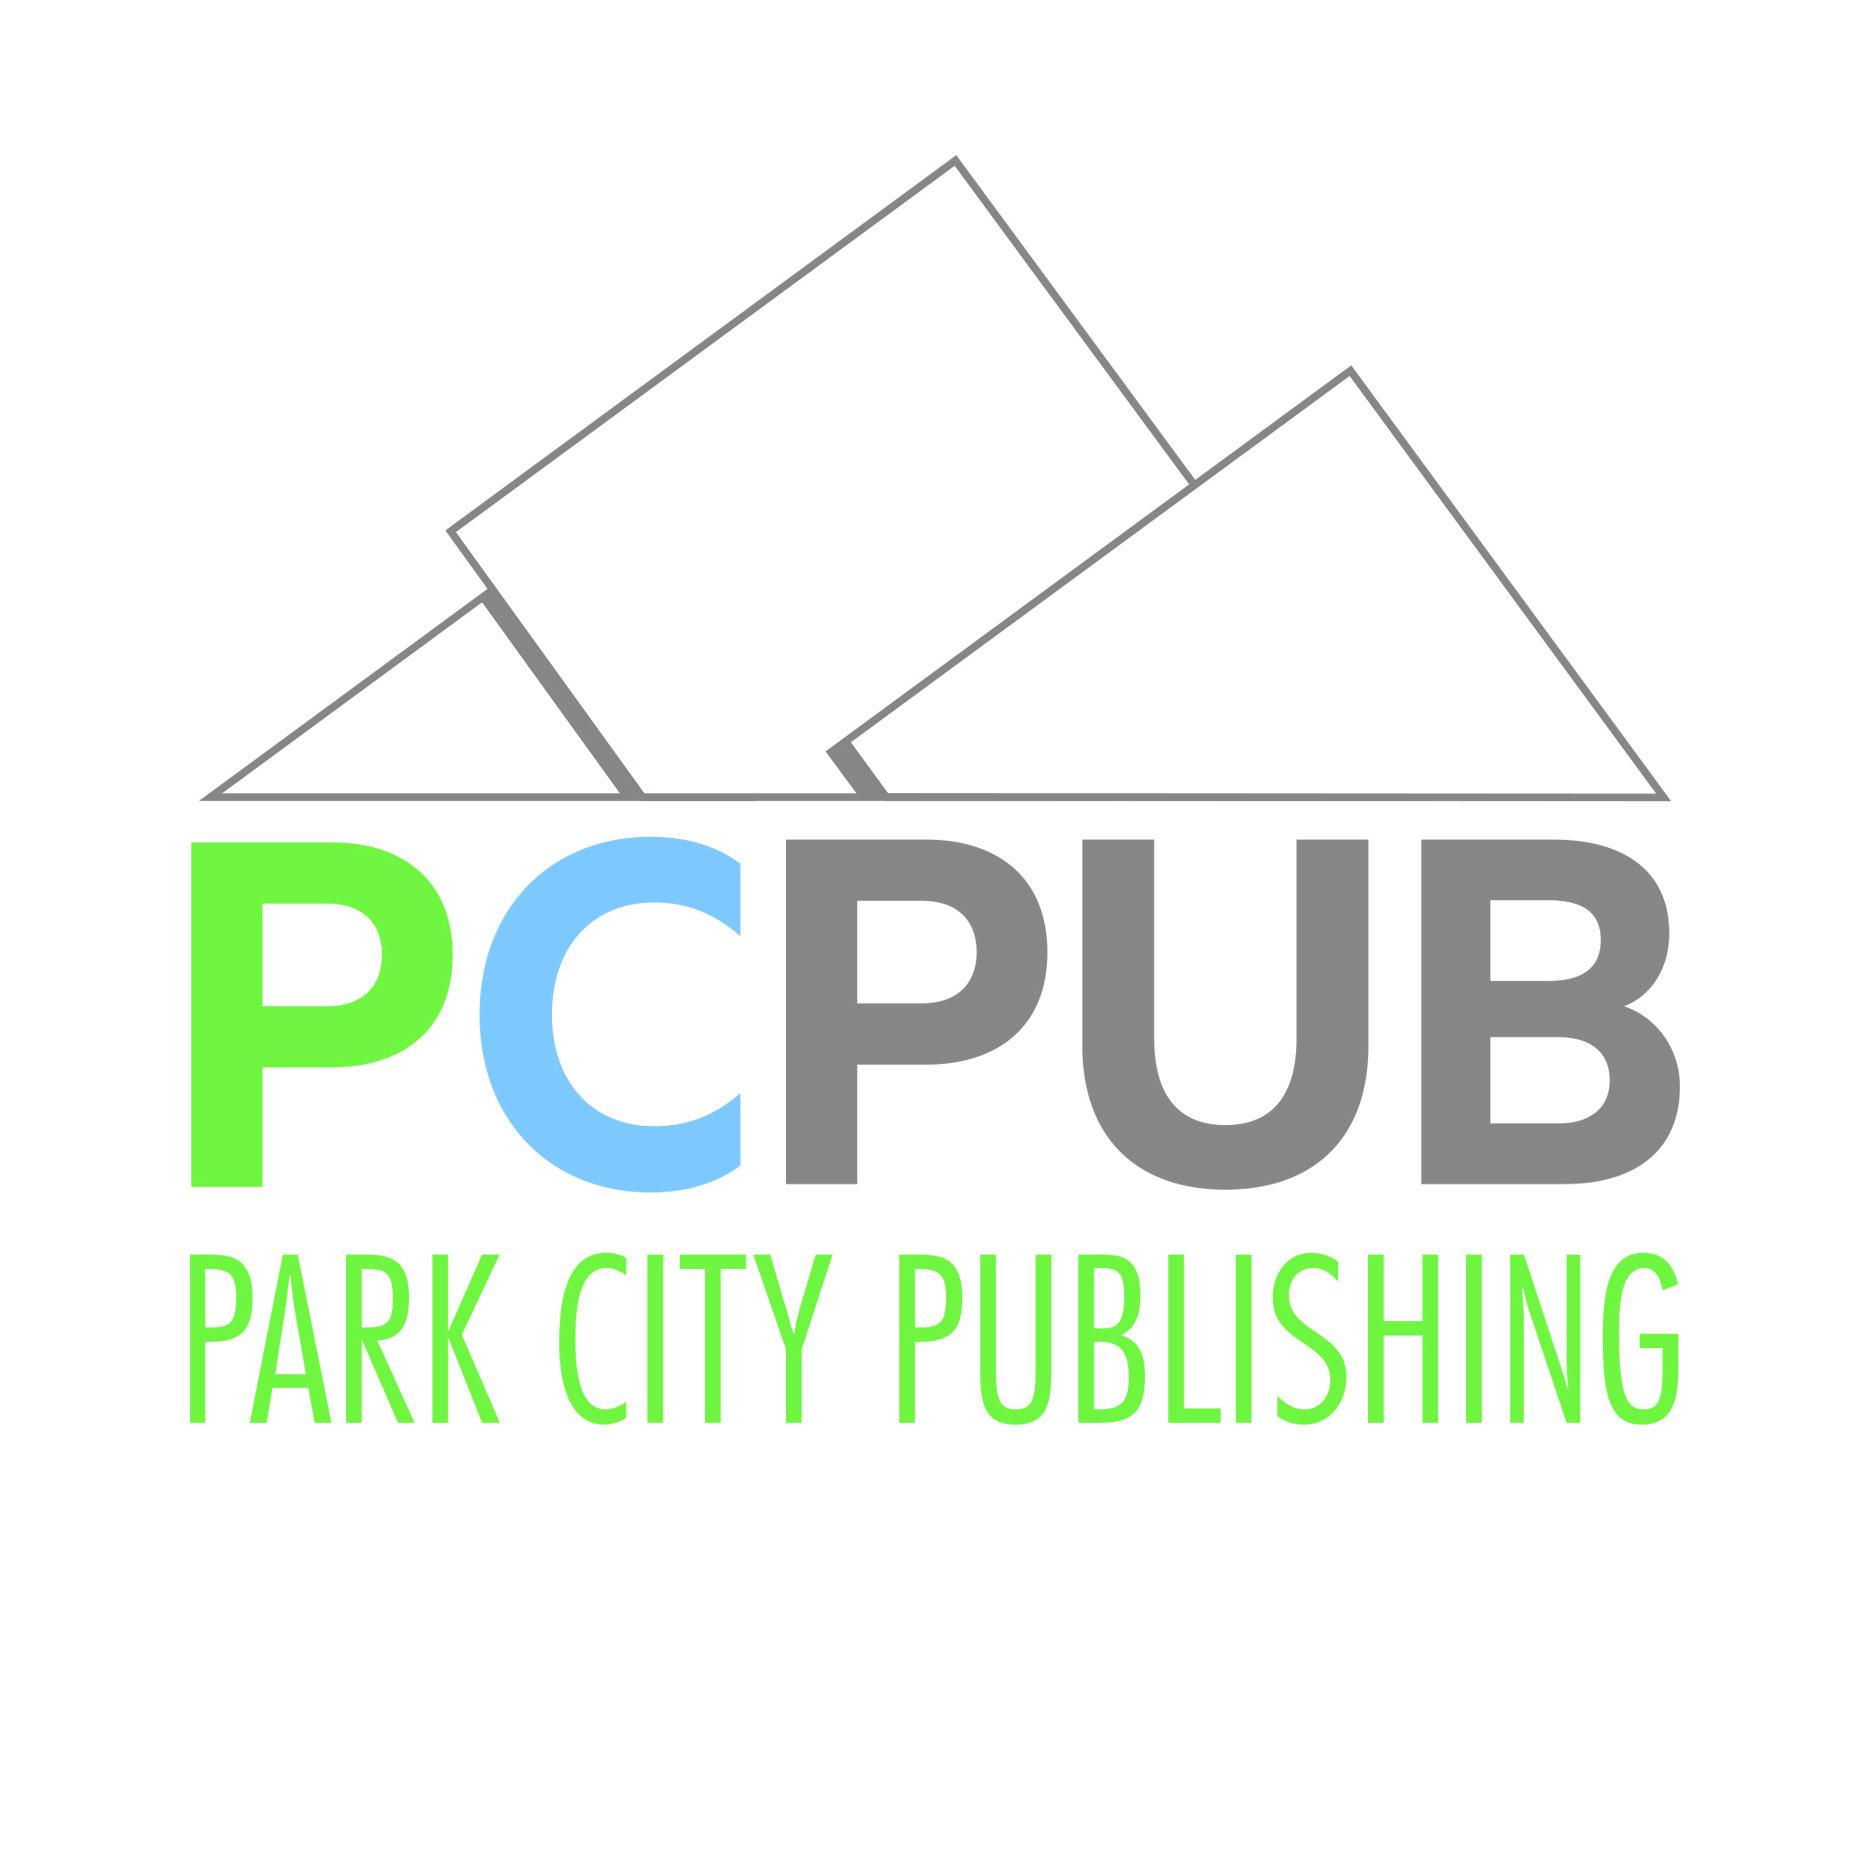 Park City Publishing